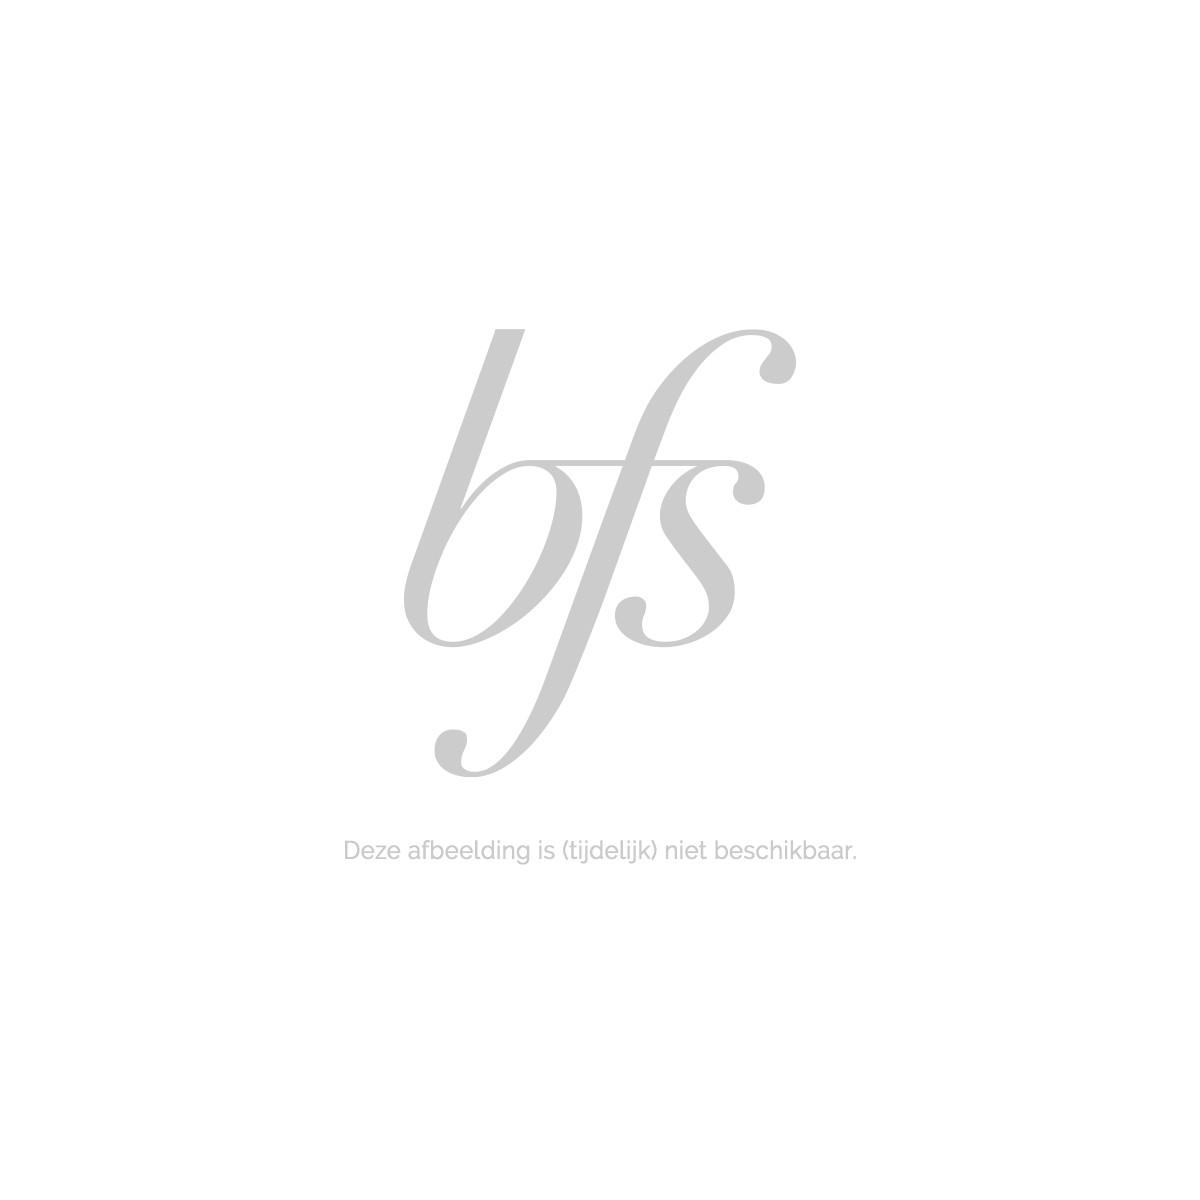 Helena Rubinstein All Mascaras Complete Eye Make Up Remover 125 Ml